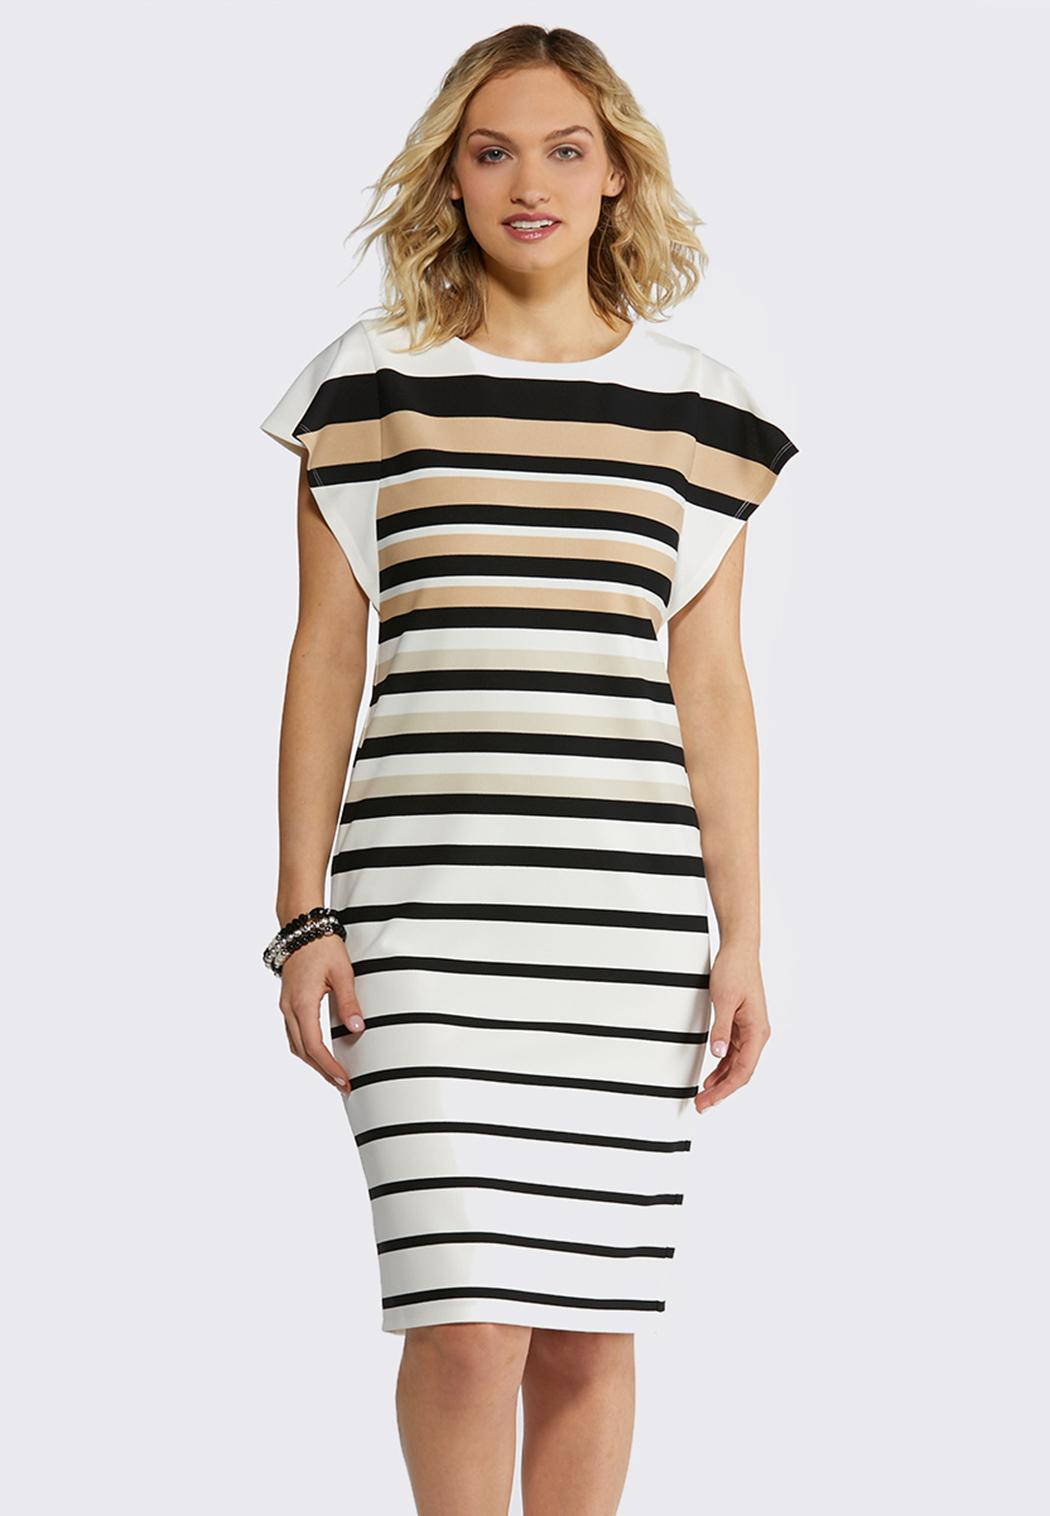 Plus Size Neutral Stripe Midi Dress Midi Cato Fashions